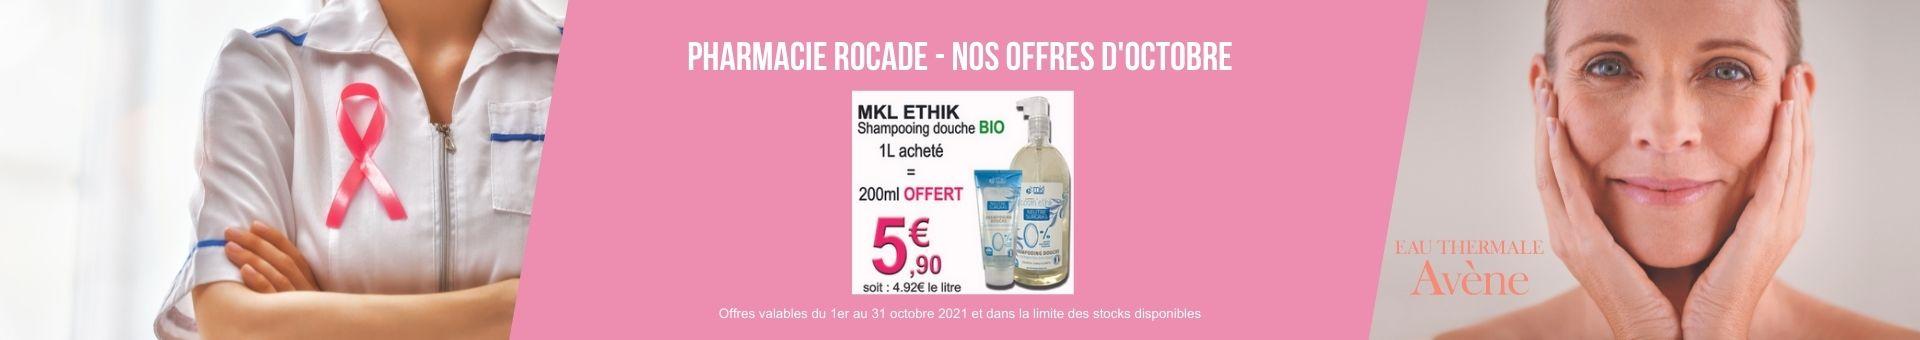 Pharmacie Saint-Martial,Bordeaux